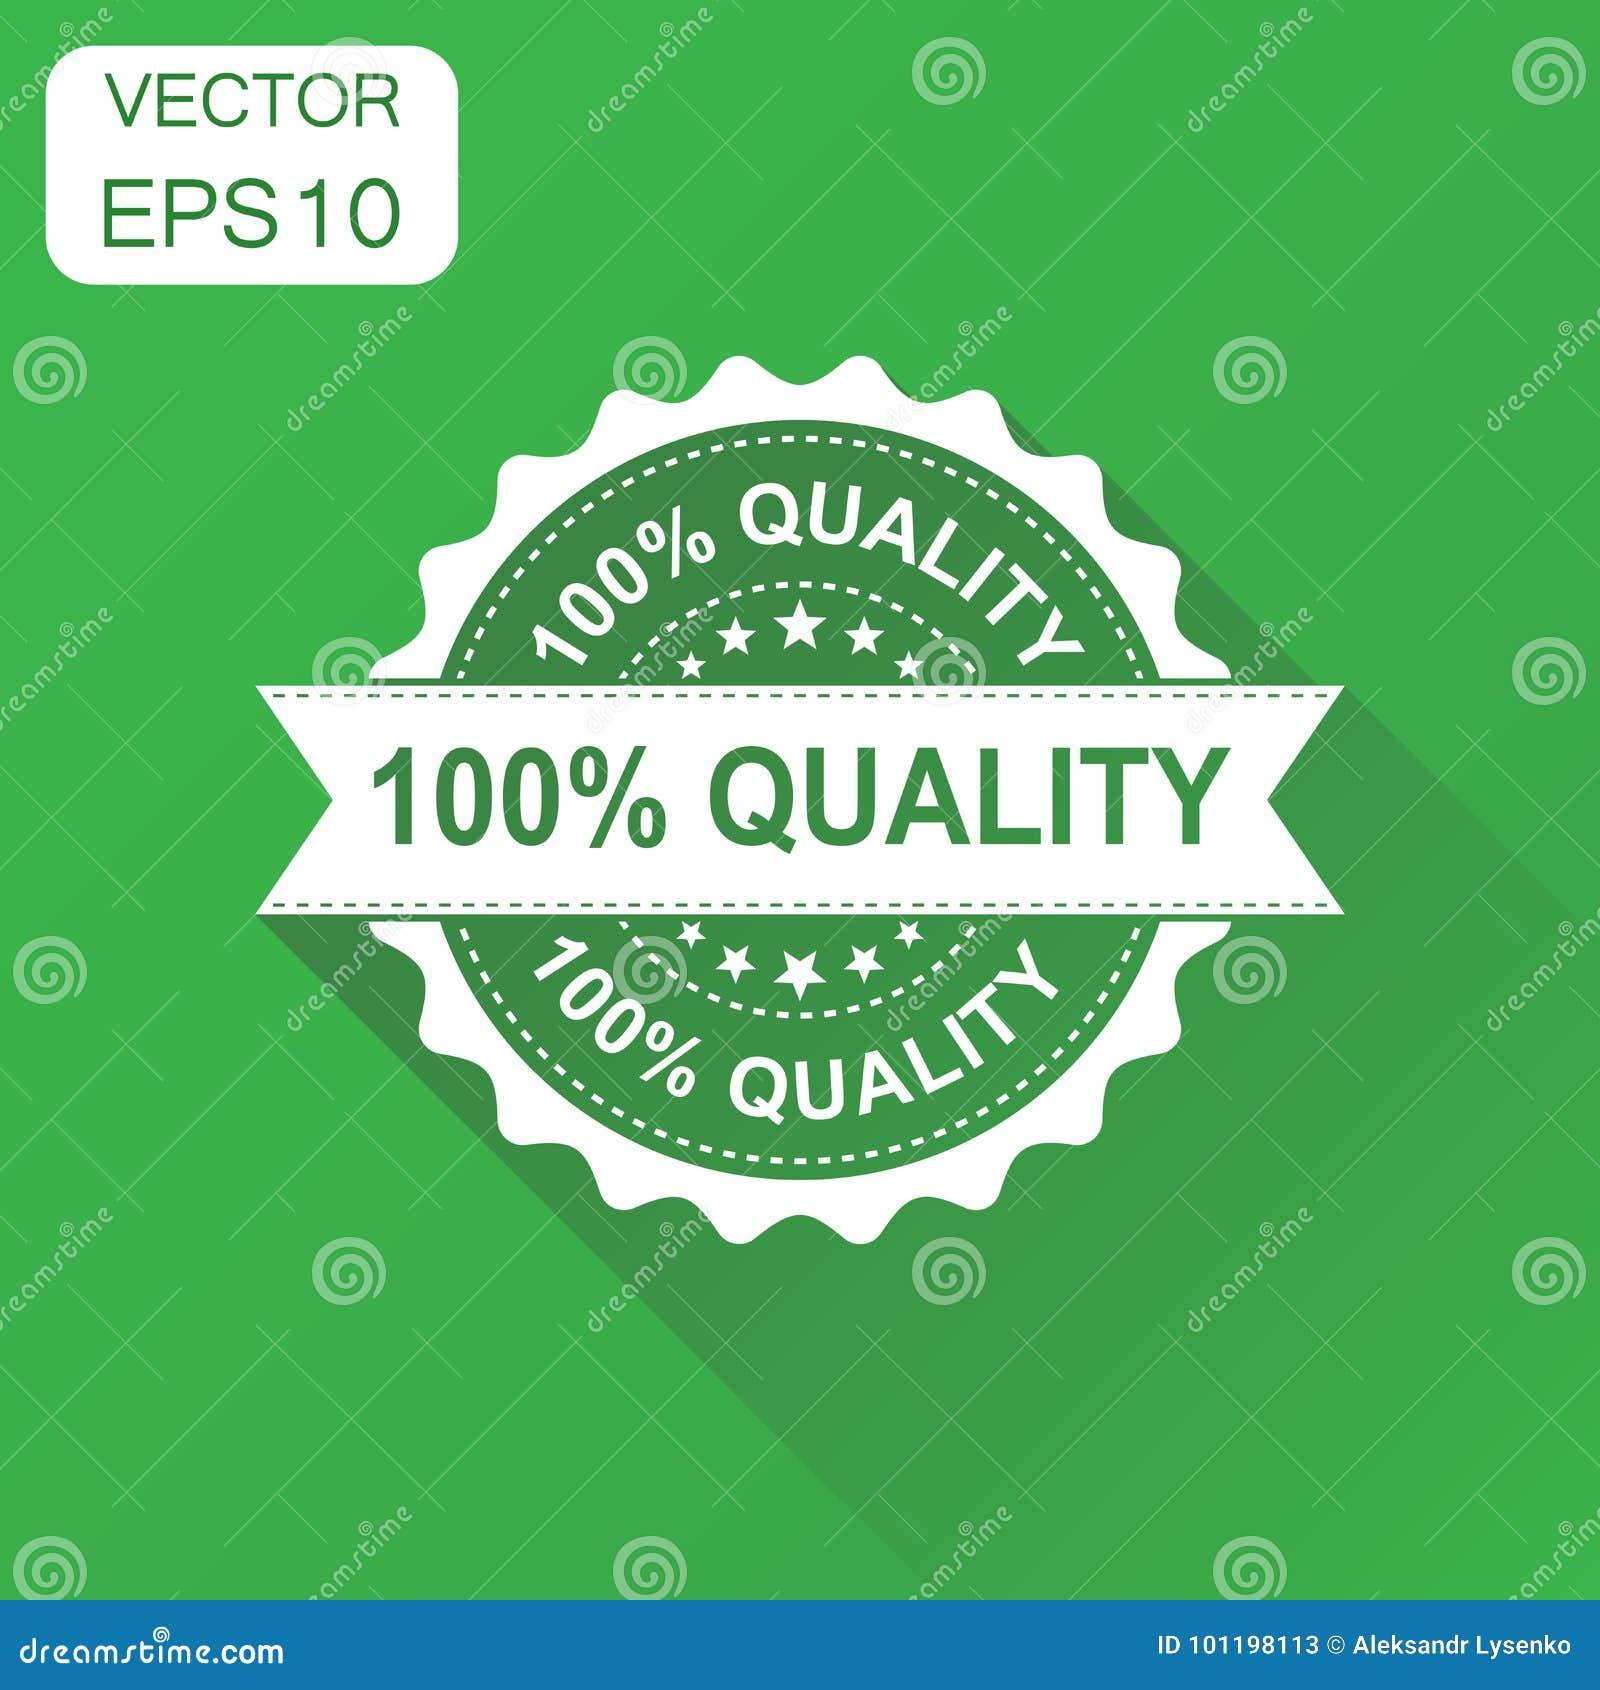 100  quality rubber stamp icon. Business concept 100 percent qua